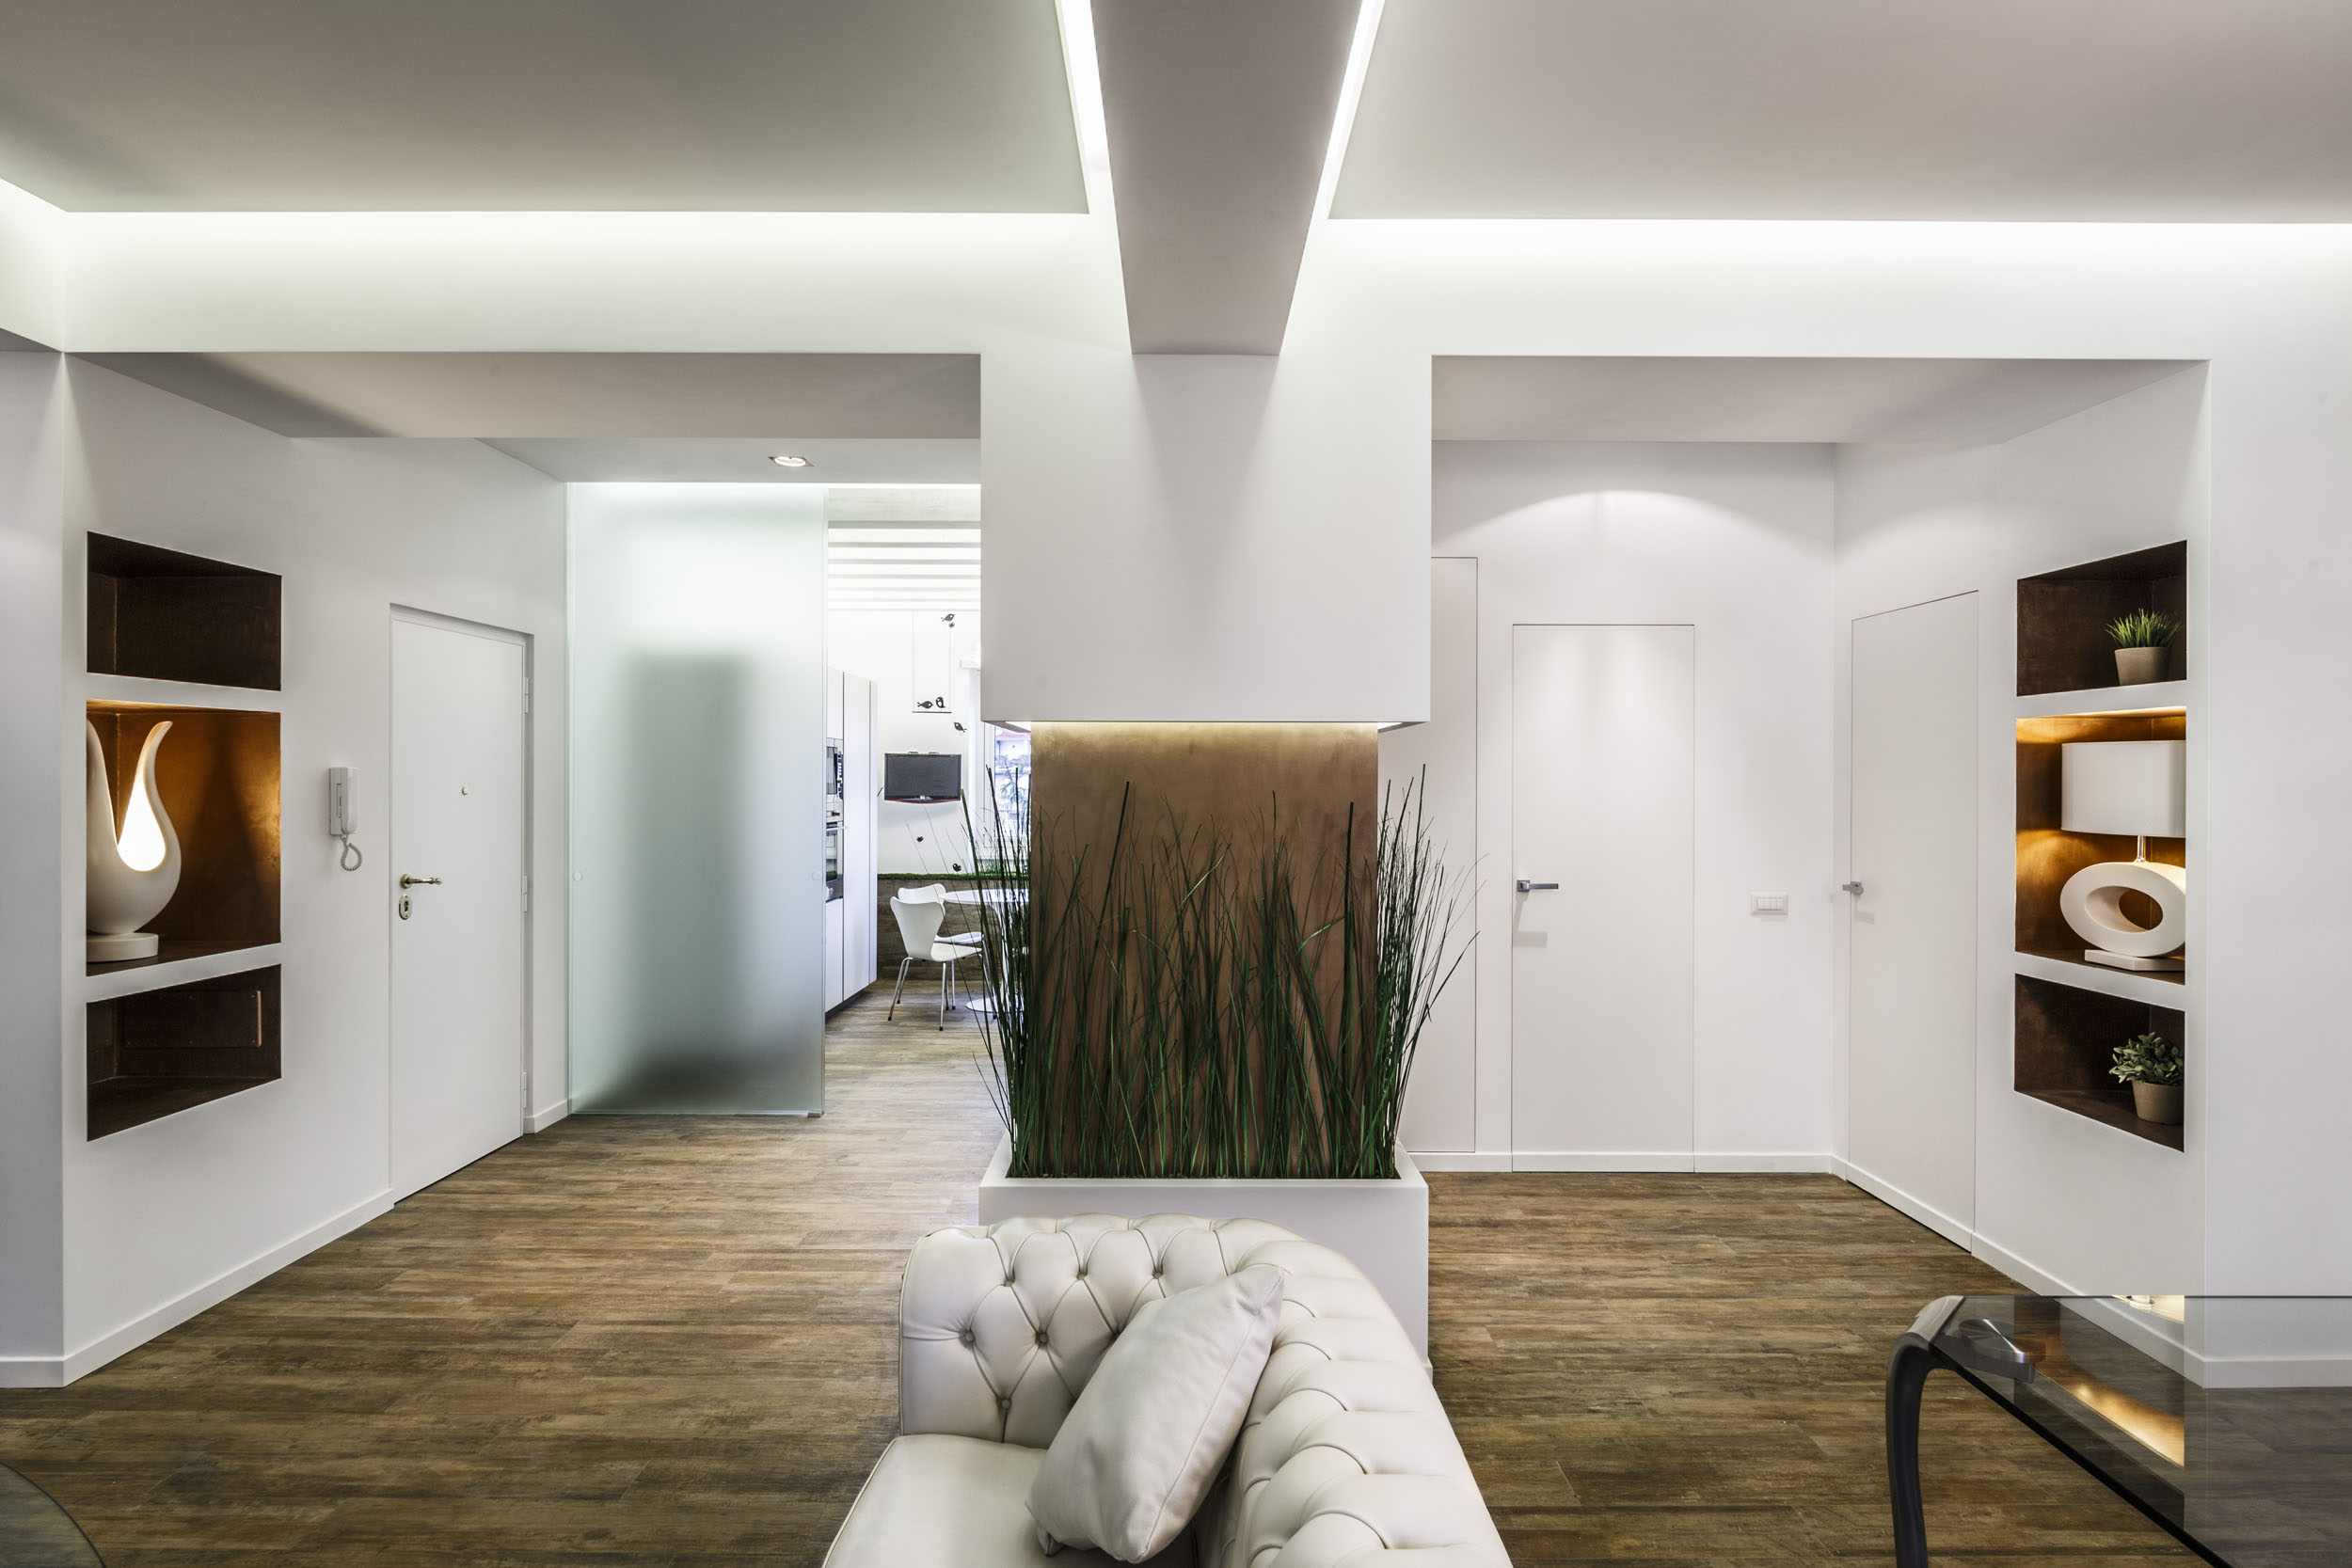 Beautiful apartment in italy by brain factory homedezen - Pilastro portante ...